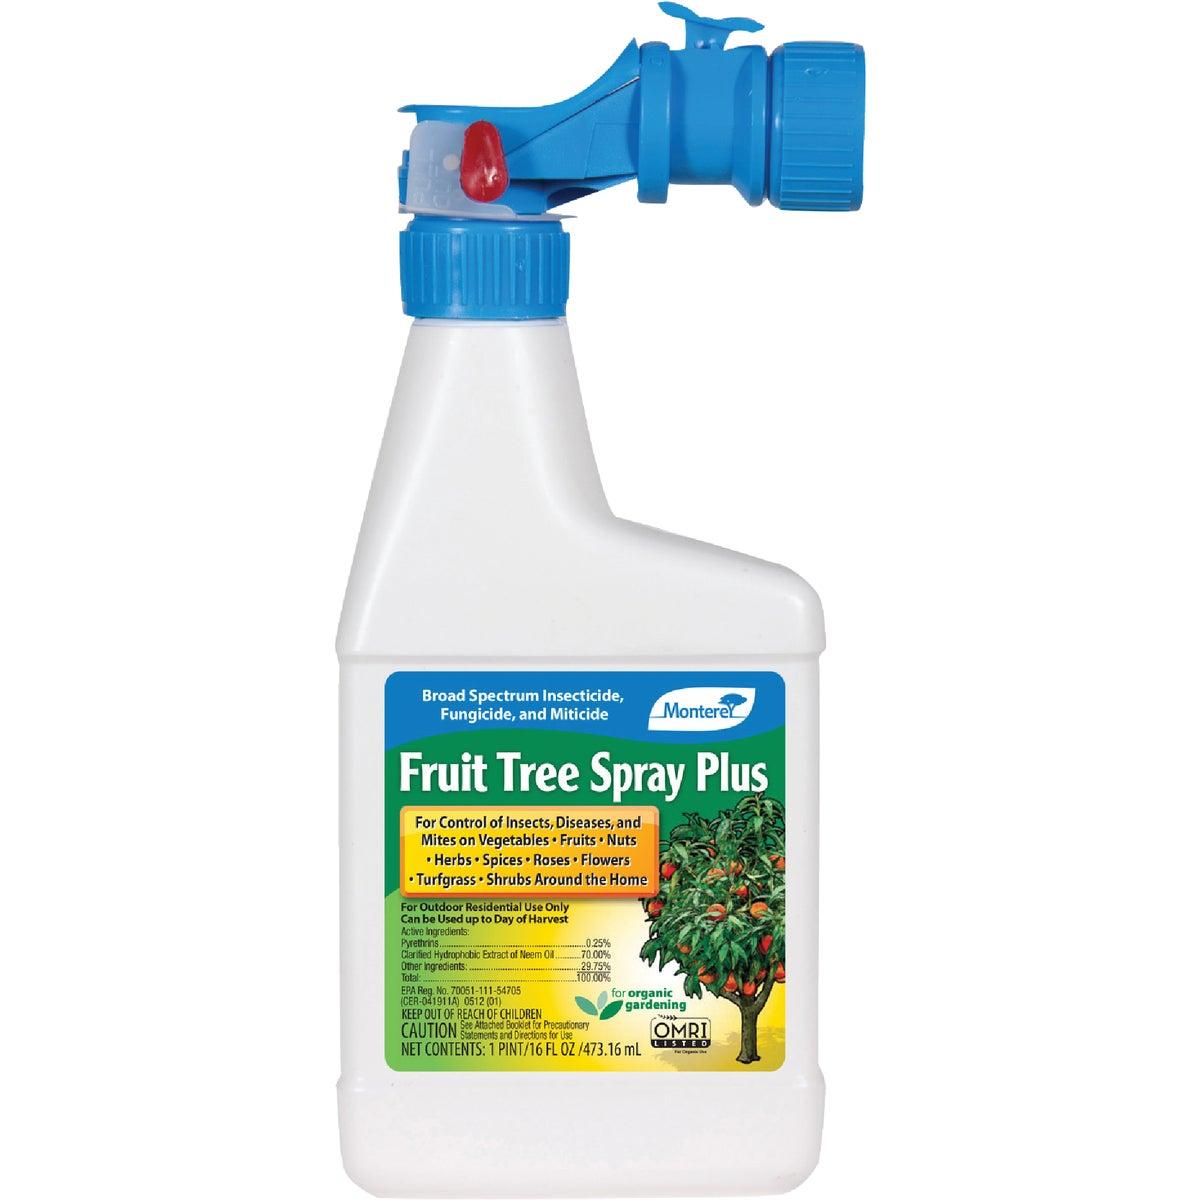 PT RTS FRUIT TREE SPRAY - LG6186 by Monterey Lawn&garden